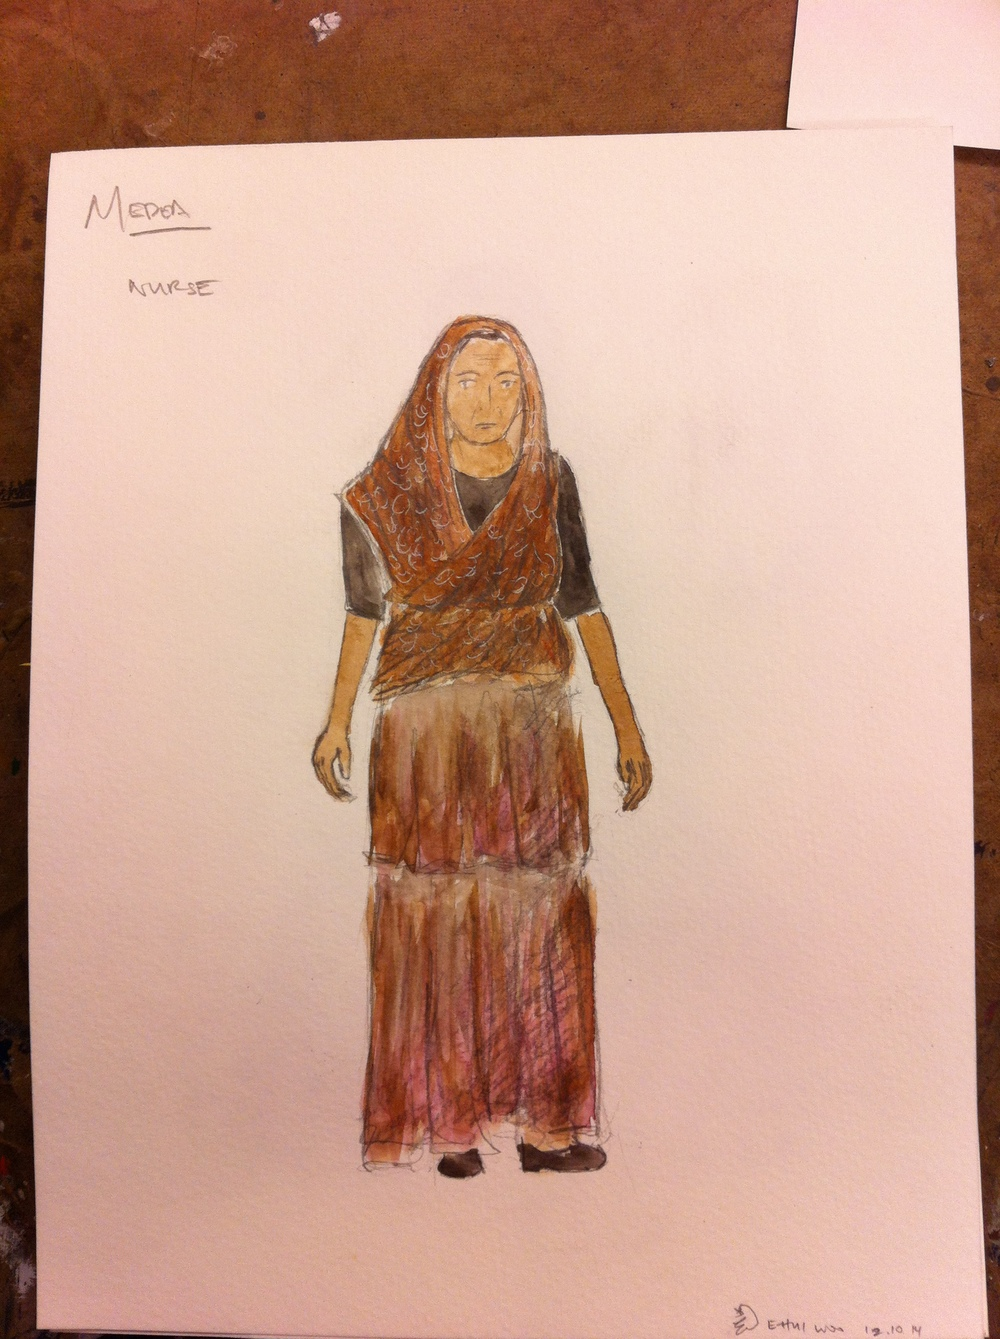 Medea - Nurse